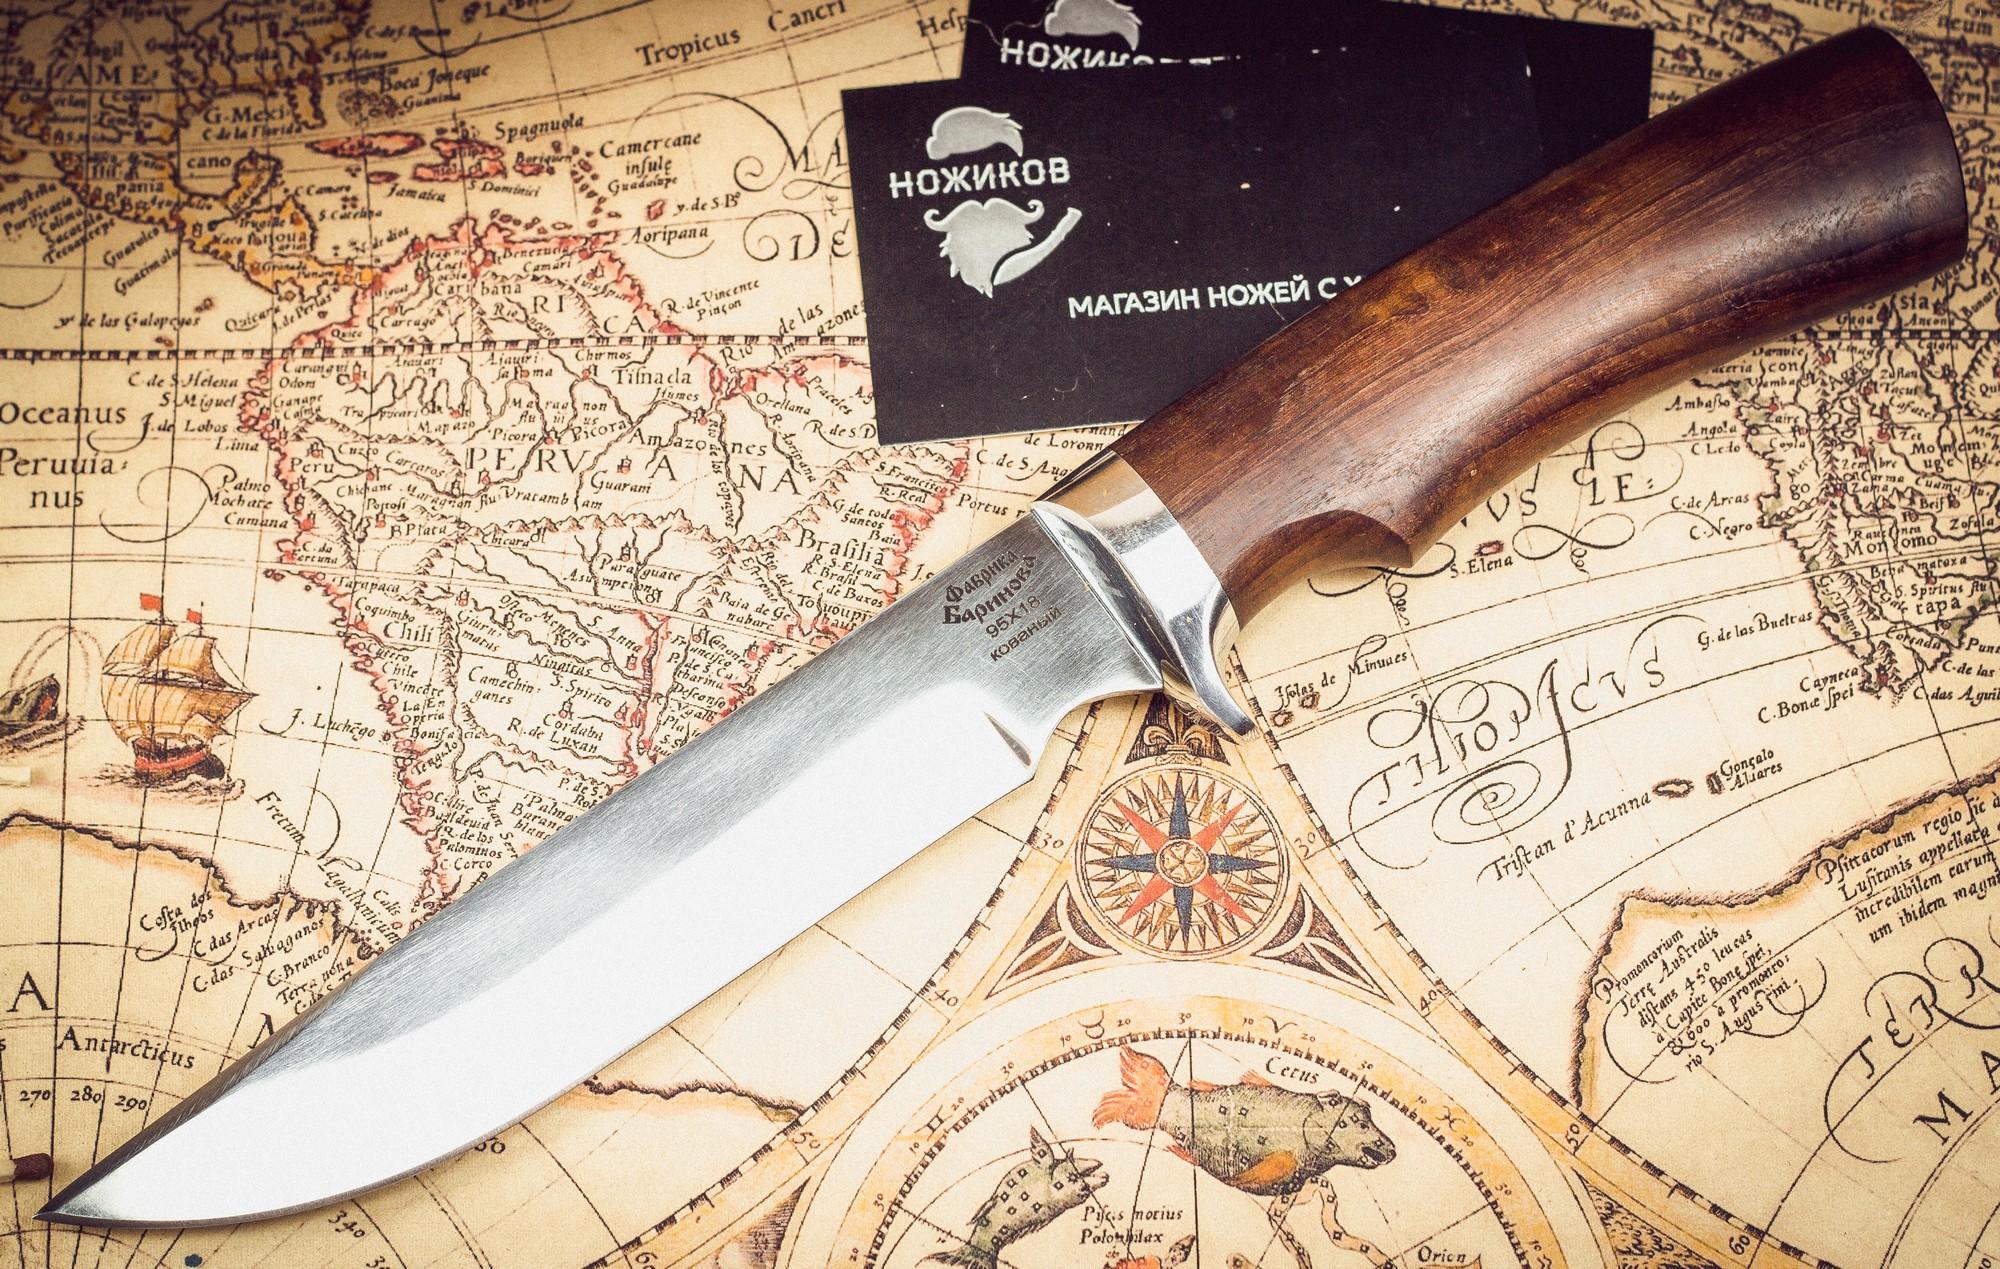 Нож Осетр 65Х13, орех и литье латунь нож страйт сталь 65х13